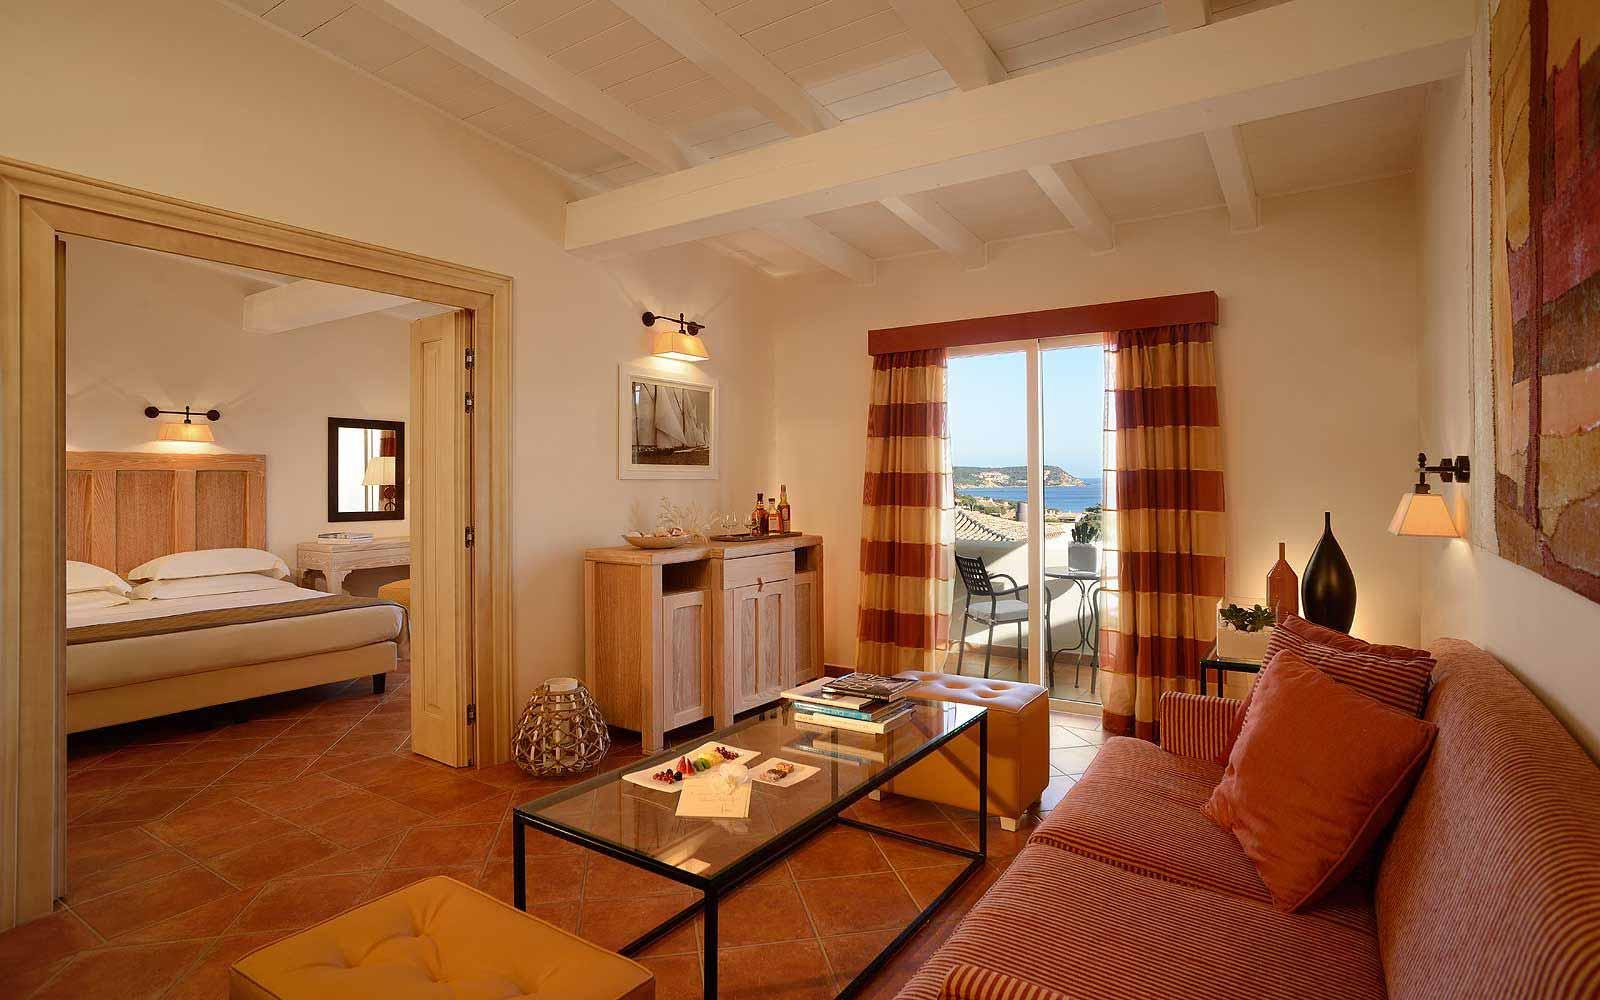 Executive Suite at Colonna Pevero Hotel